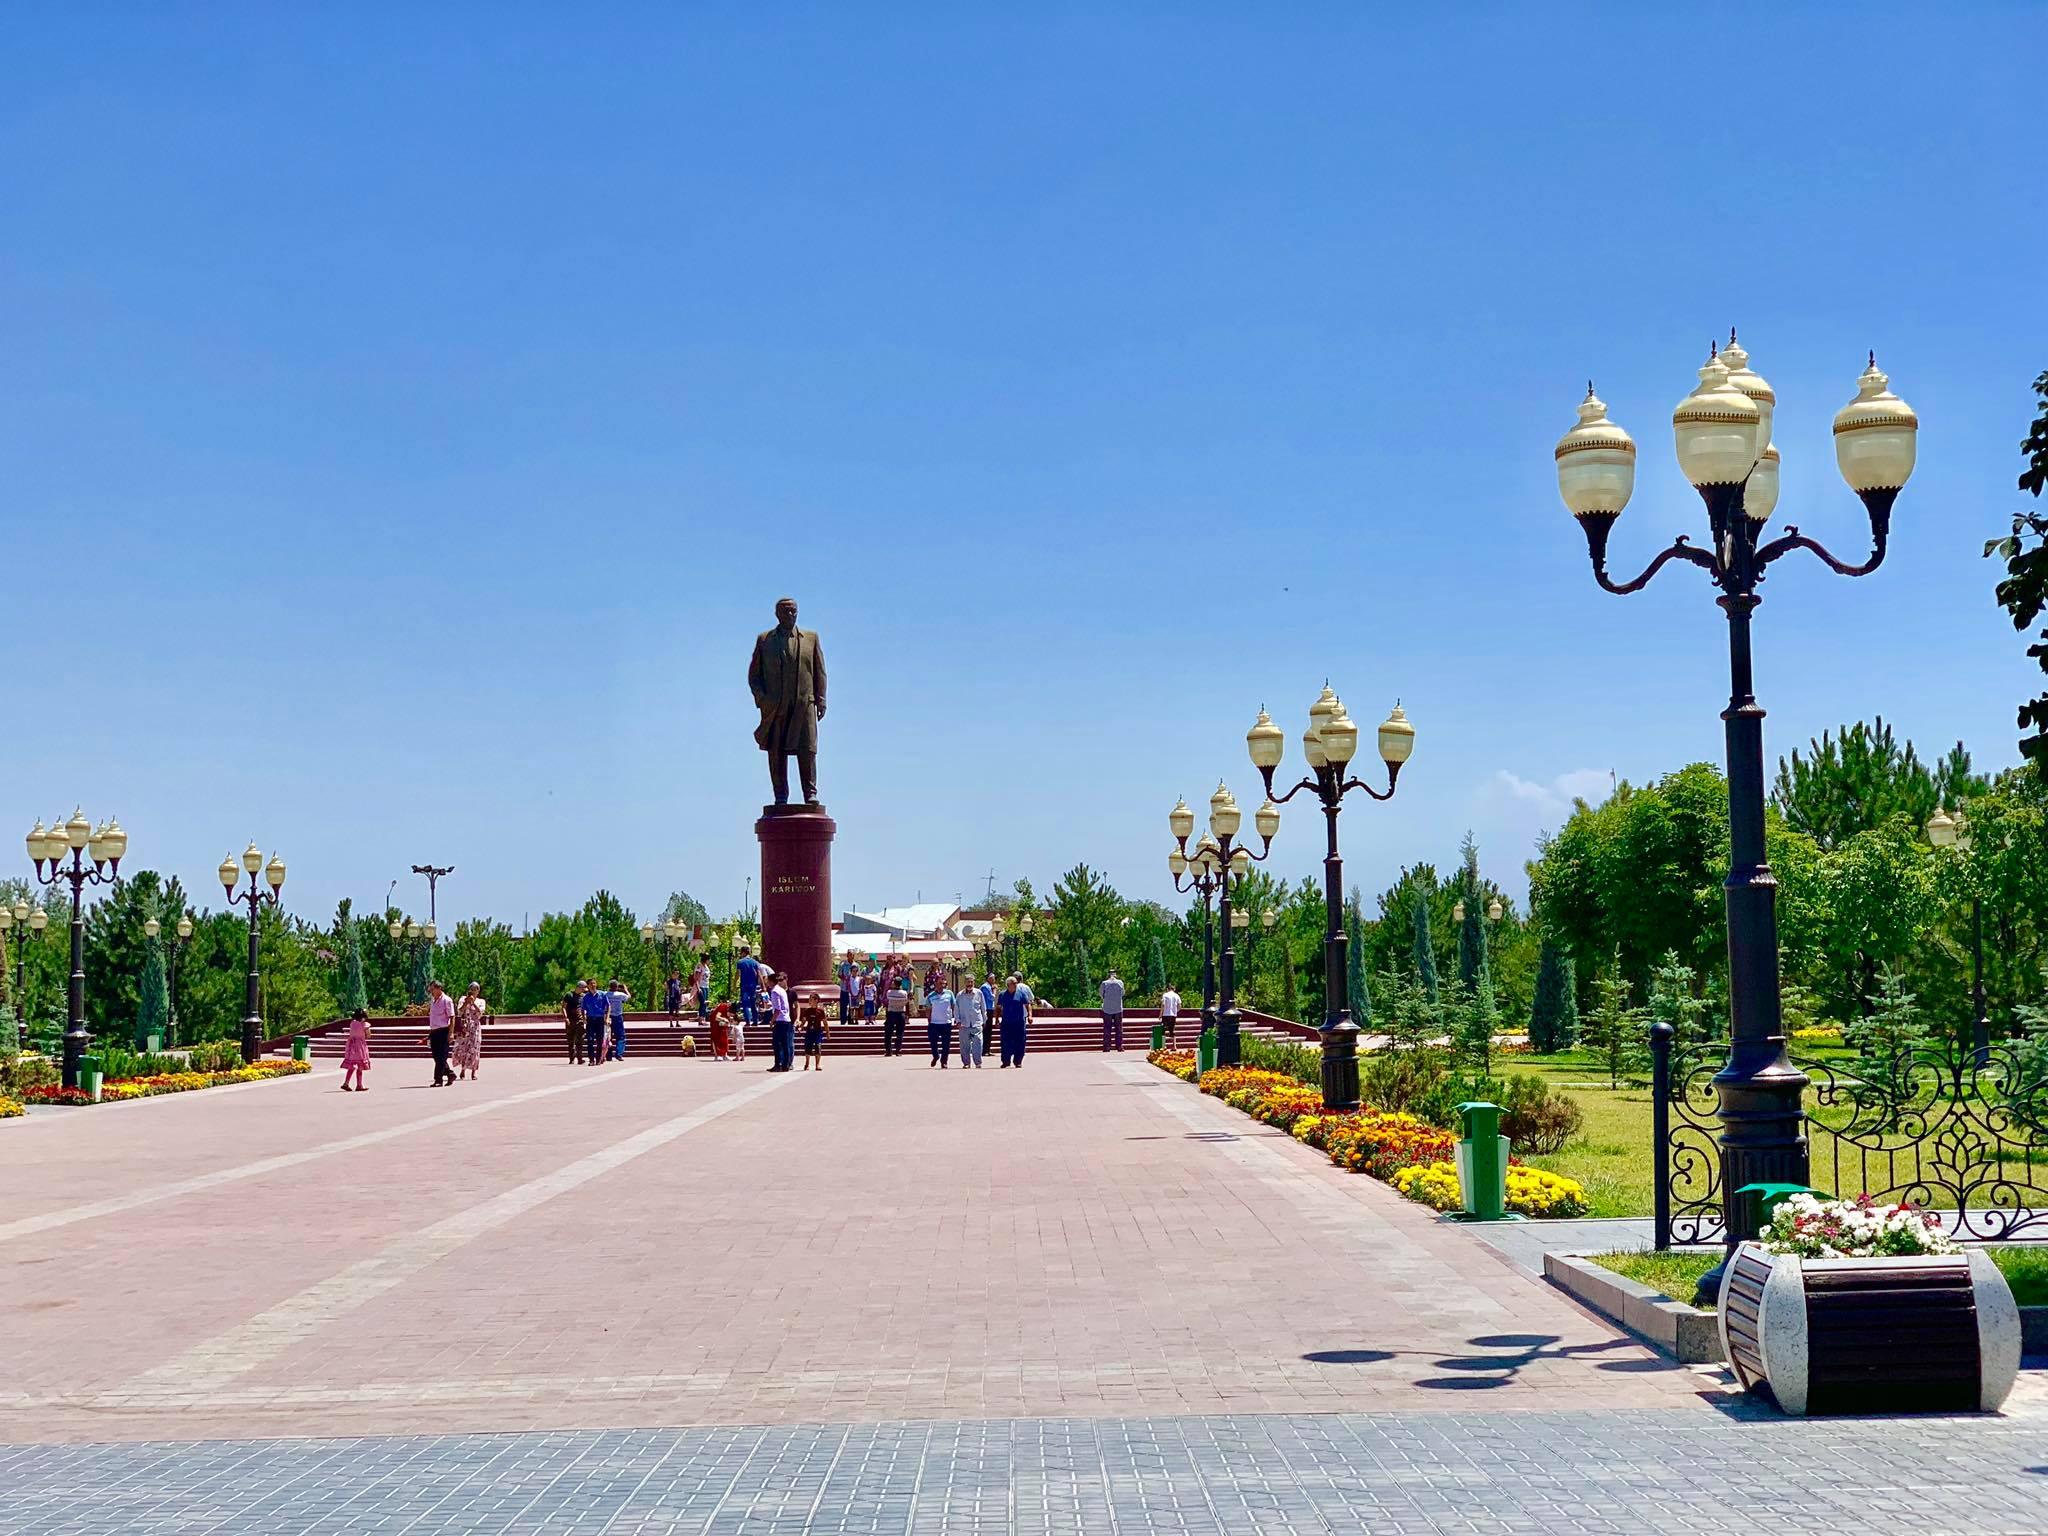 Kach Solo Travels in 2019 Siyab Bazaar and Registan on my first day in Samarkand.jpg